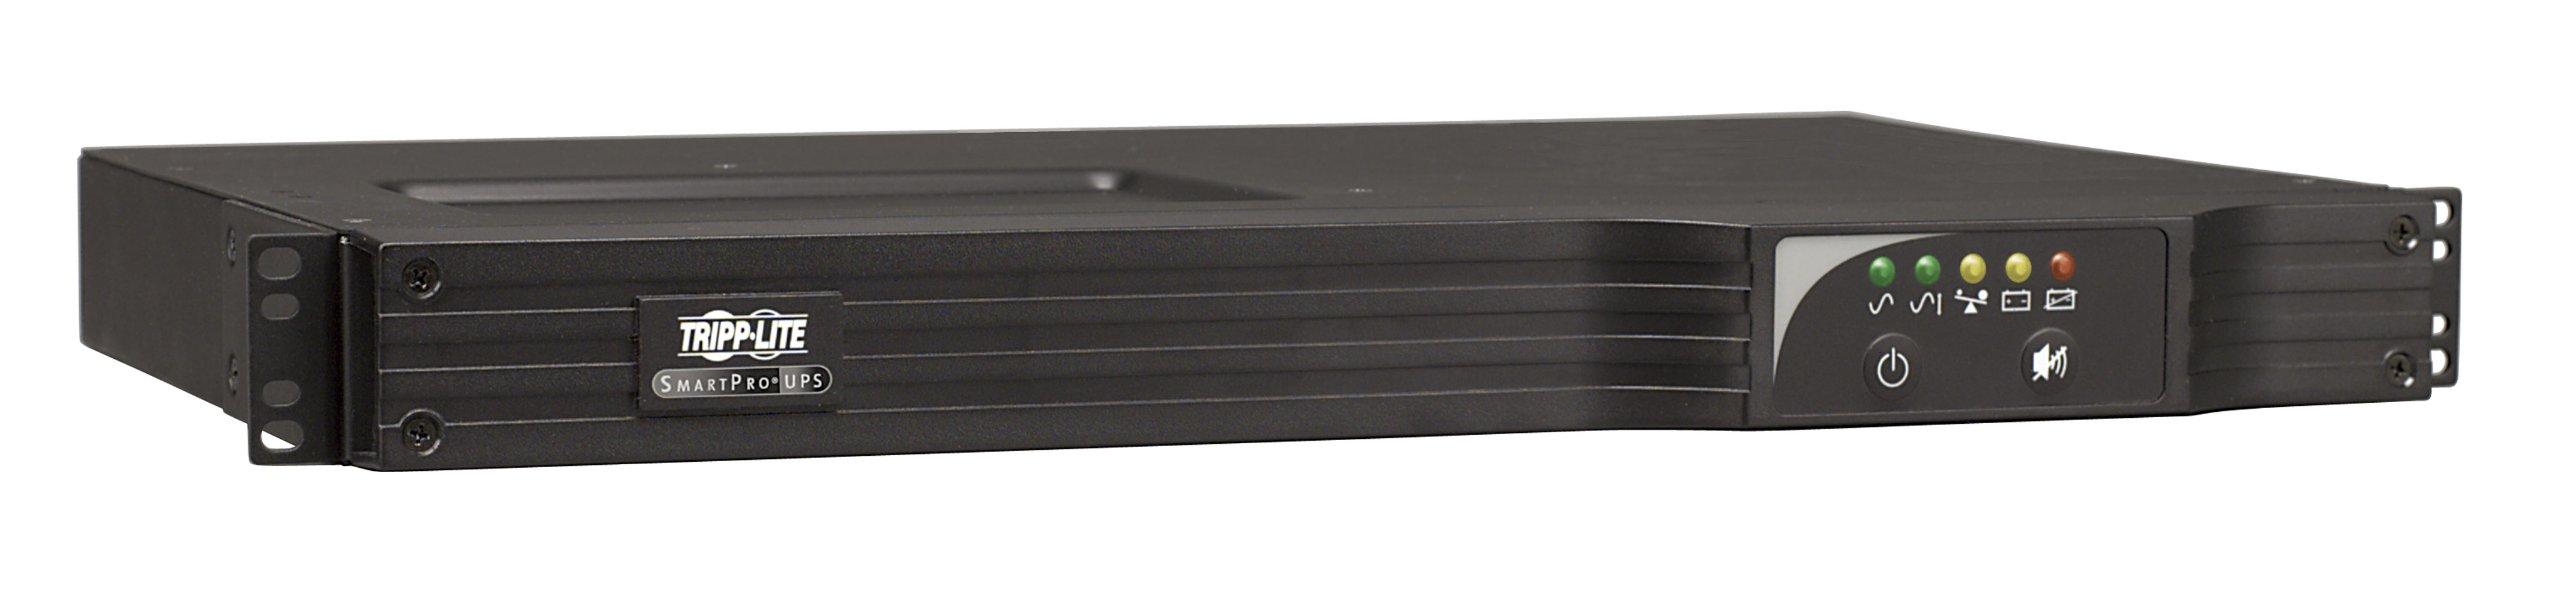 Tripp Lite 1000VA Smart UPS Back Up, Sine Wave, AVR, 120V 800W Line-Interactive, 1U Rackmount, USB, DB9, ENERGY STAR (SMART1000RM1U)